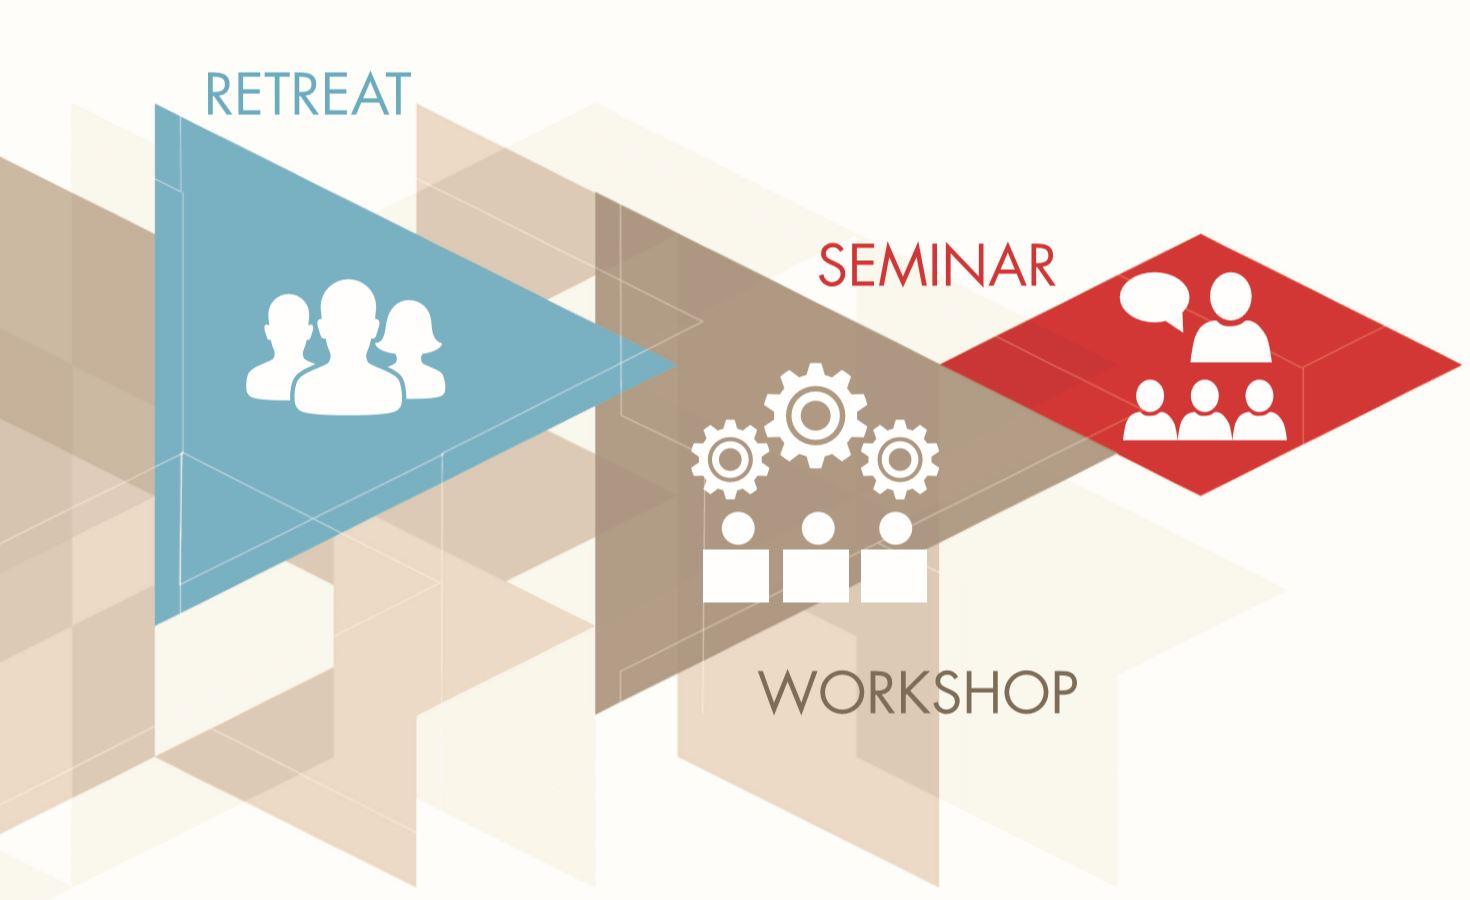 hopenet training services for professional development